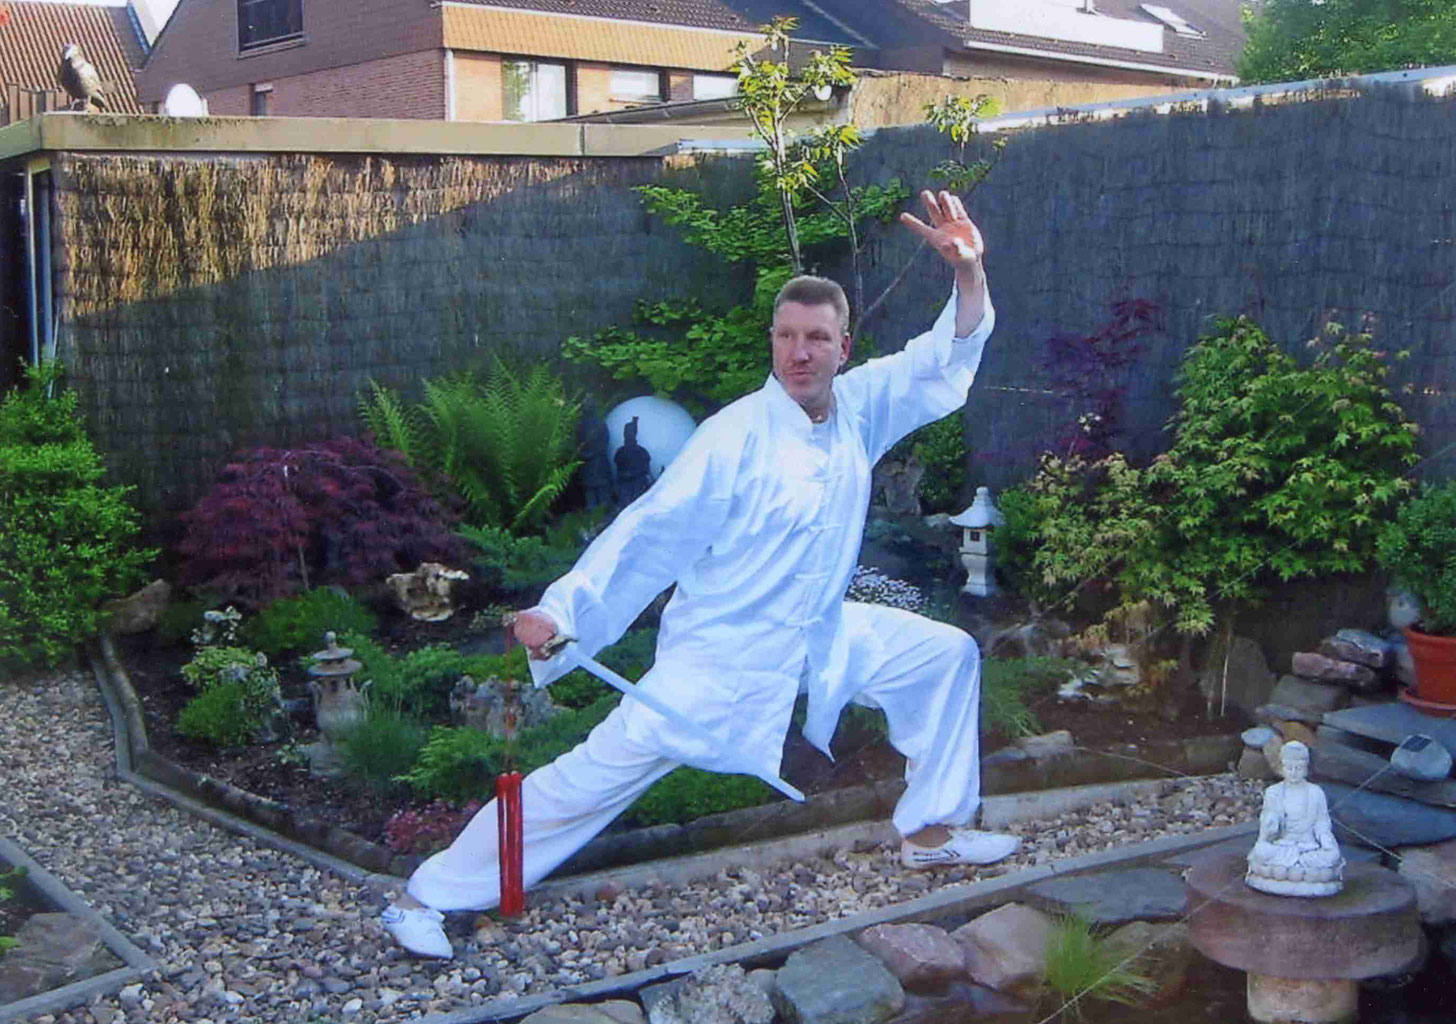 tai chi trainer karate dojo sandokan. Black Bedroom Furniture Sets. Home Design Ideas